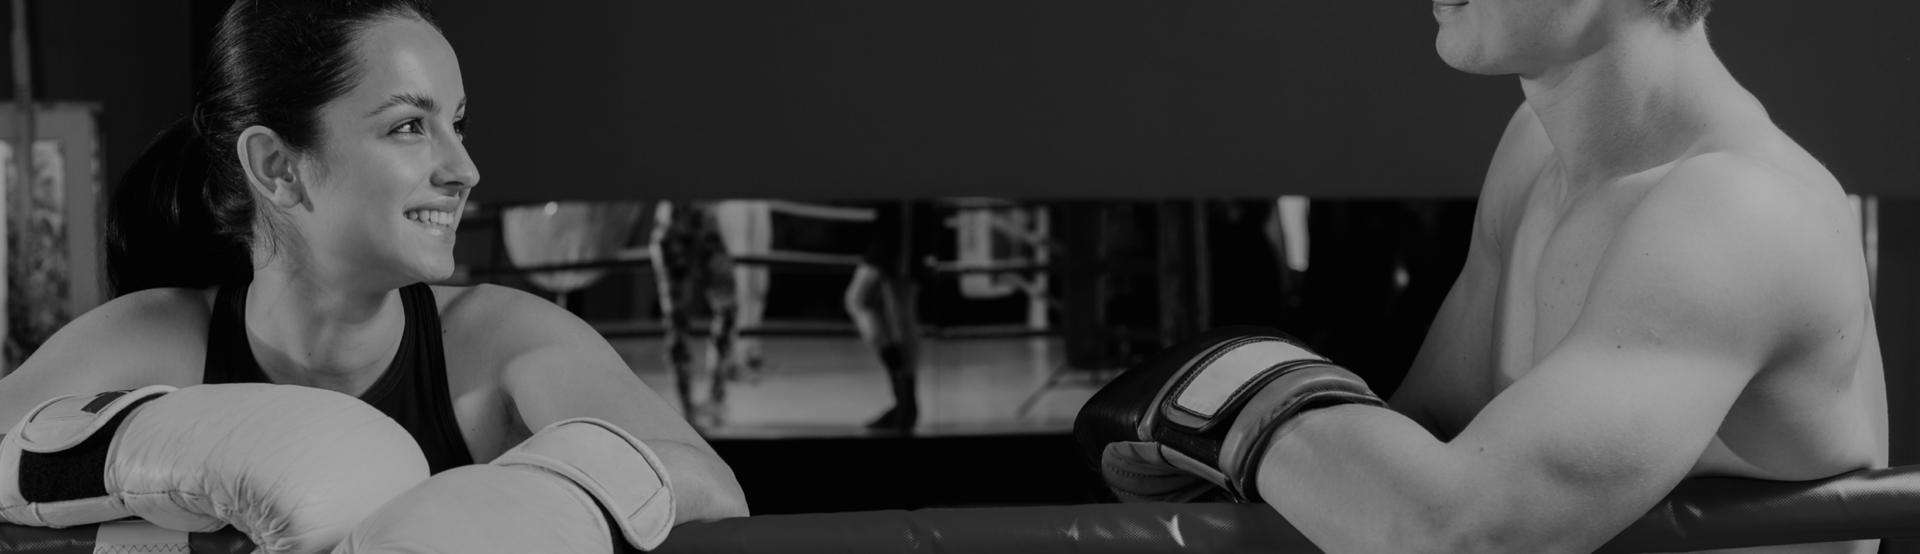 Clases de Boxeo | The Boxer Club